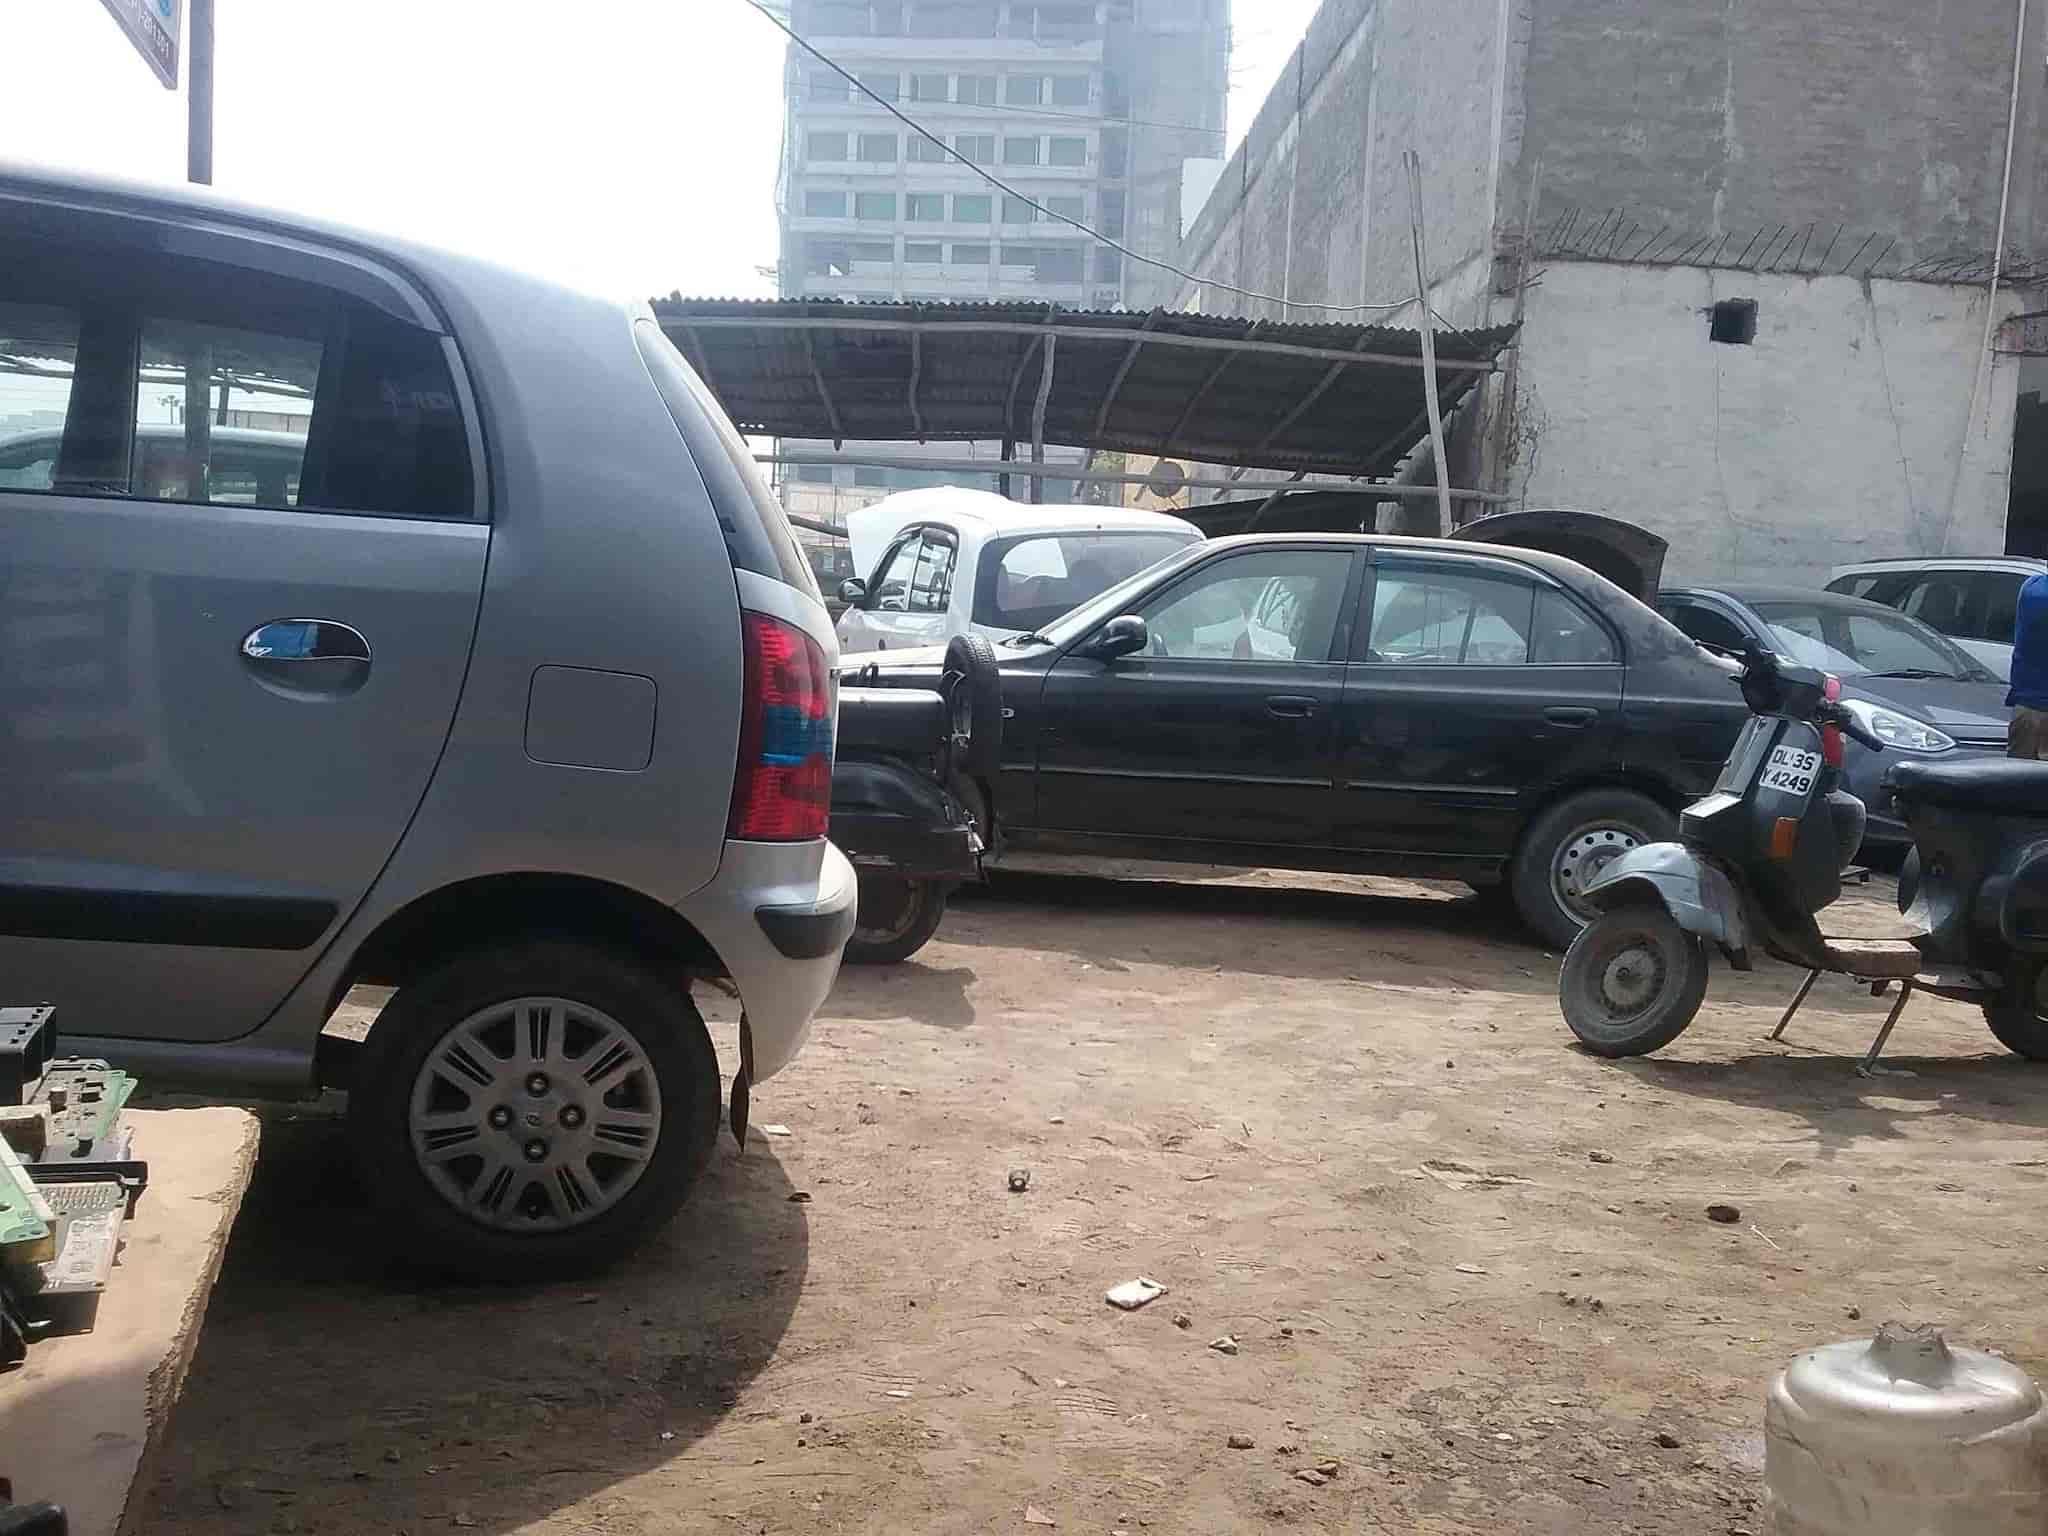 Rahul Car Ecm Eps Repair Scanner Sector 66 Scanning Computerised In Noida Delhi Justdial